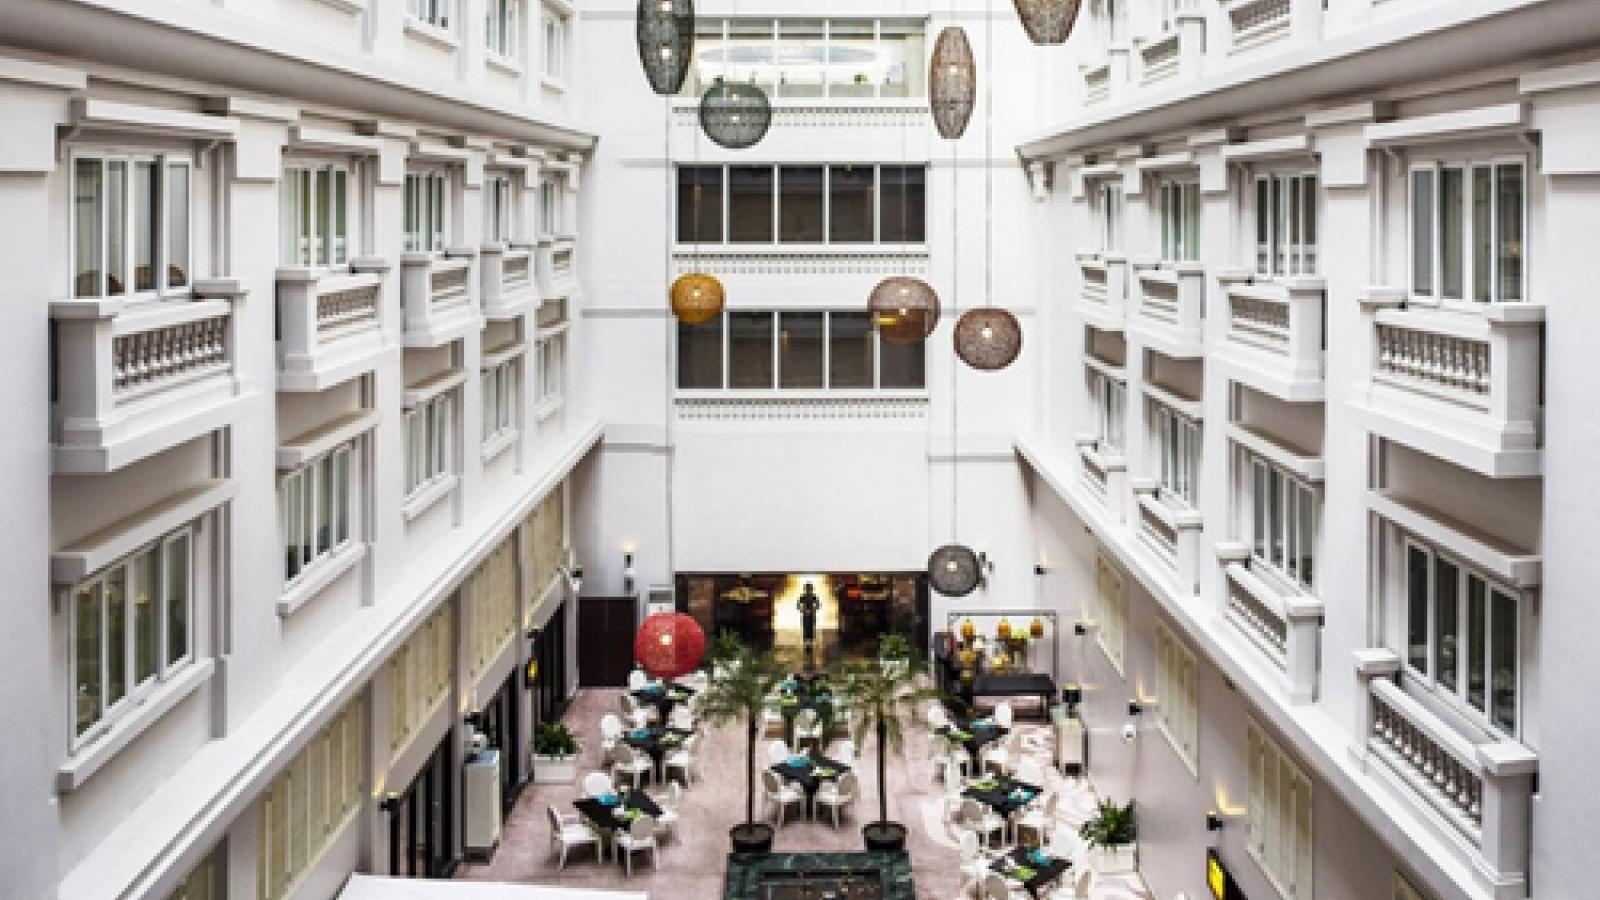 Hanoi's best boutique hotels featured in CNN Travel